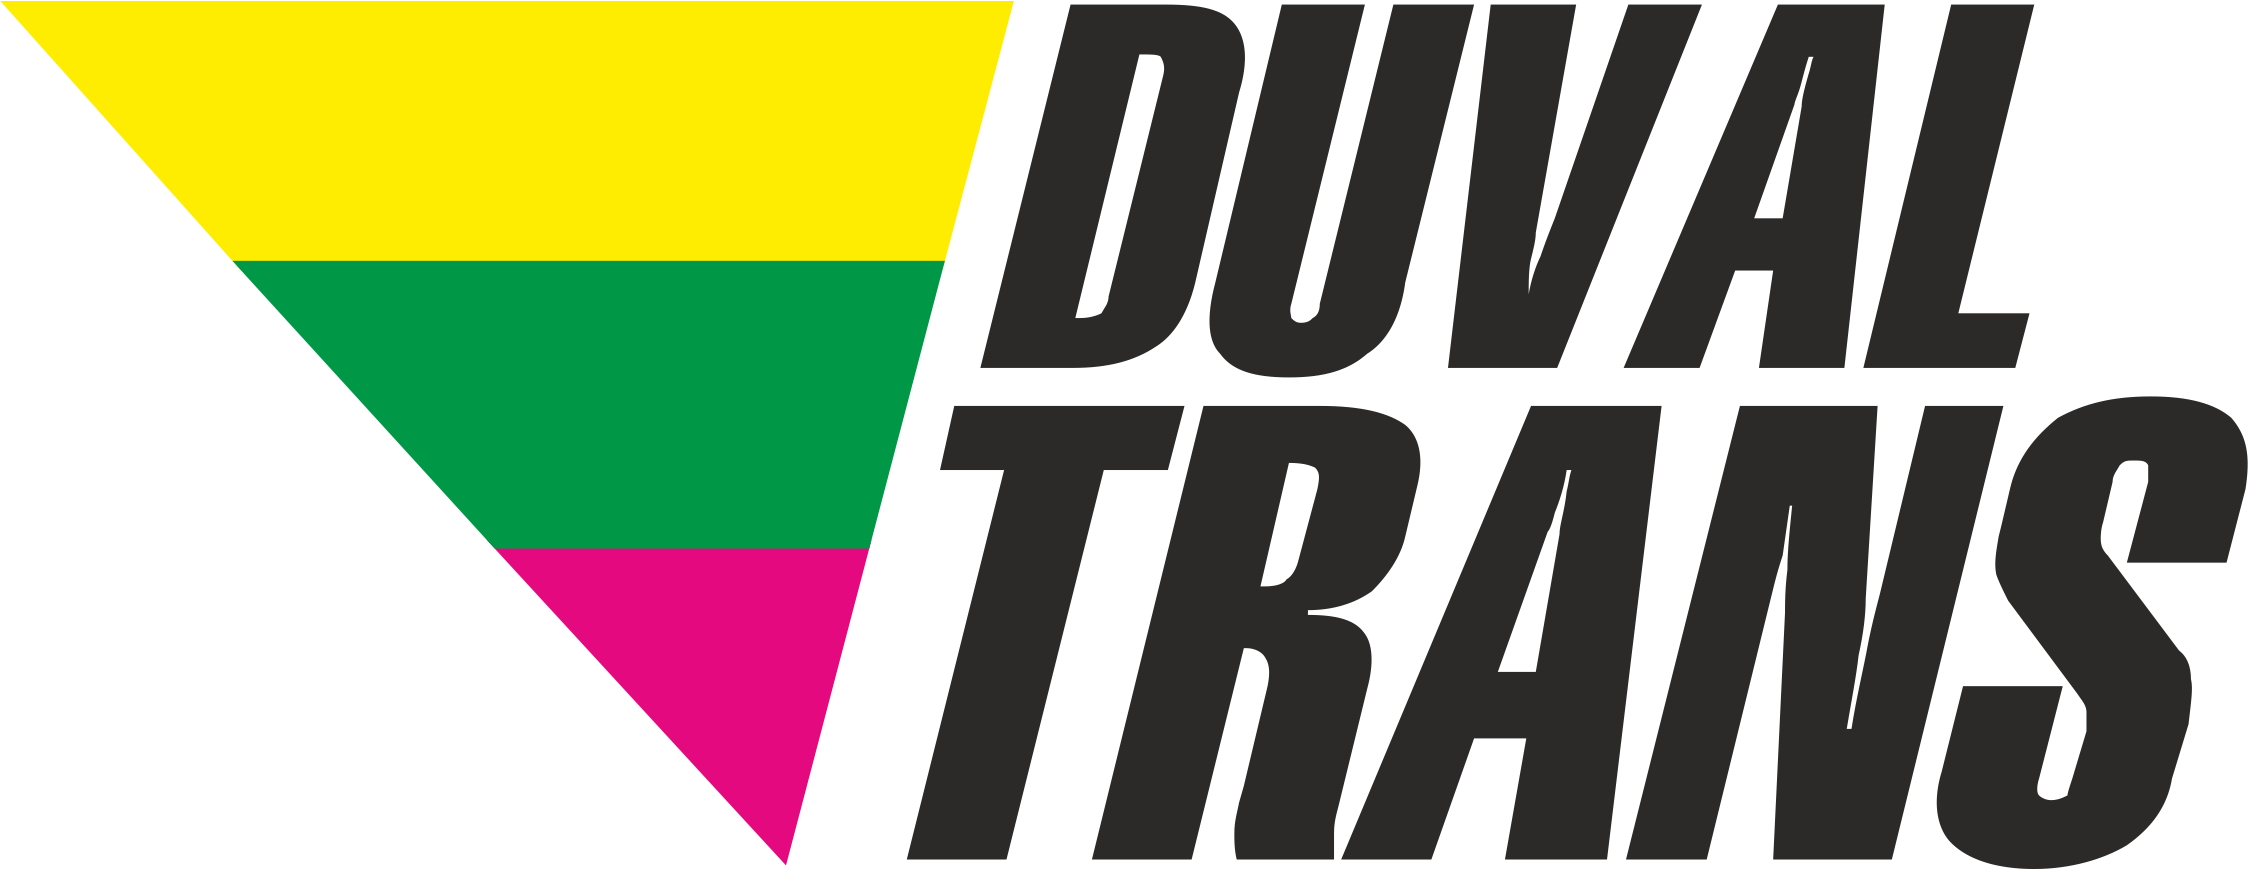 DuVal trans